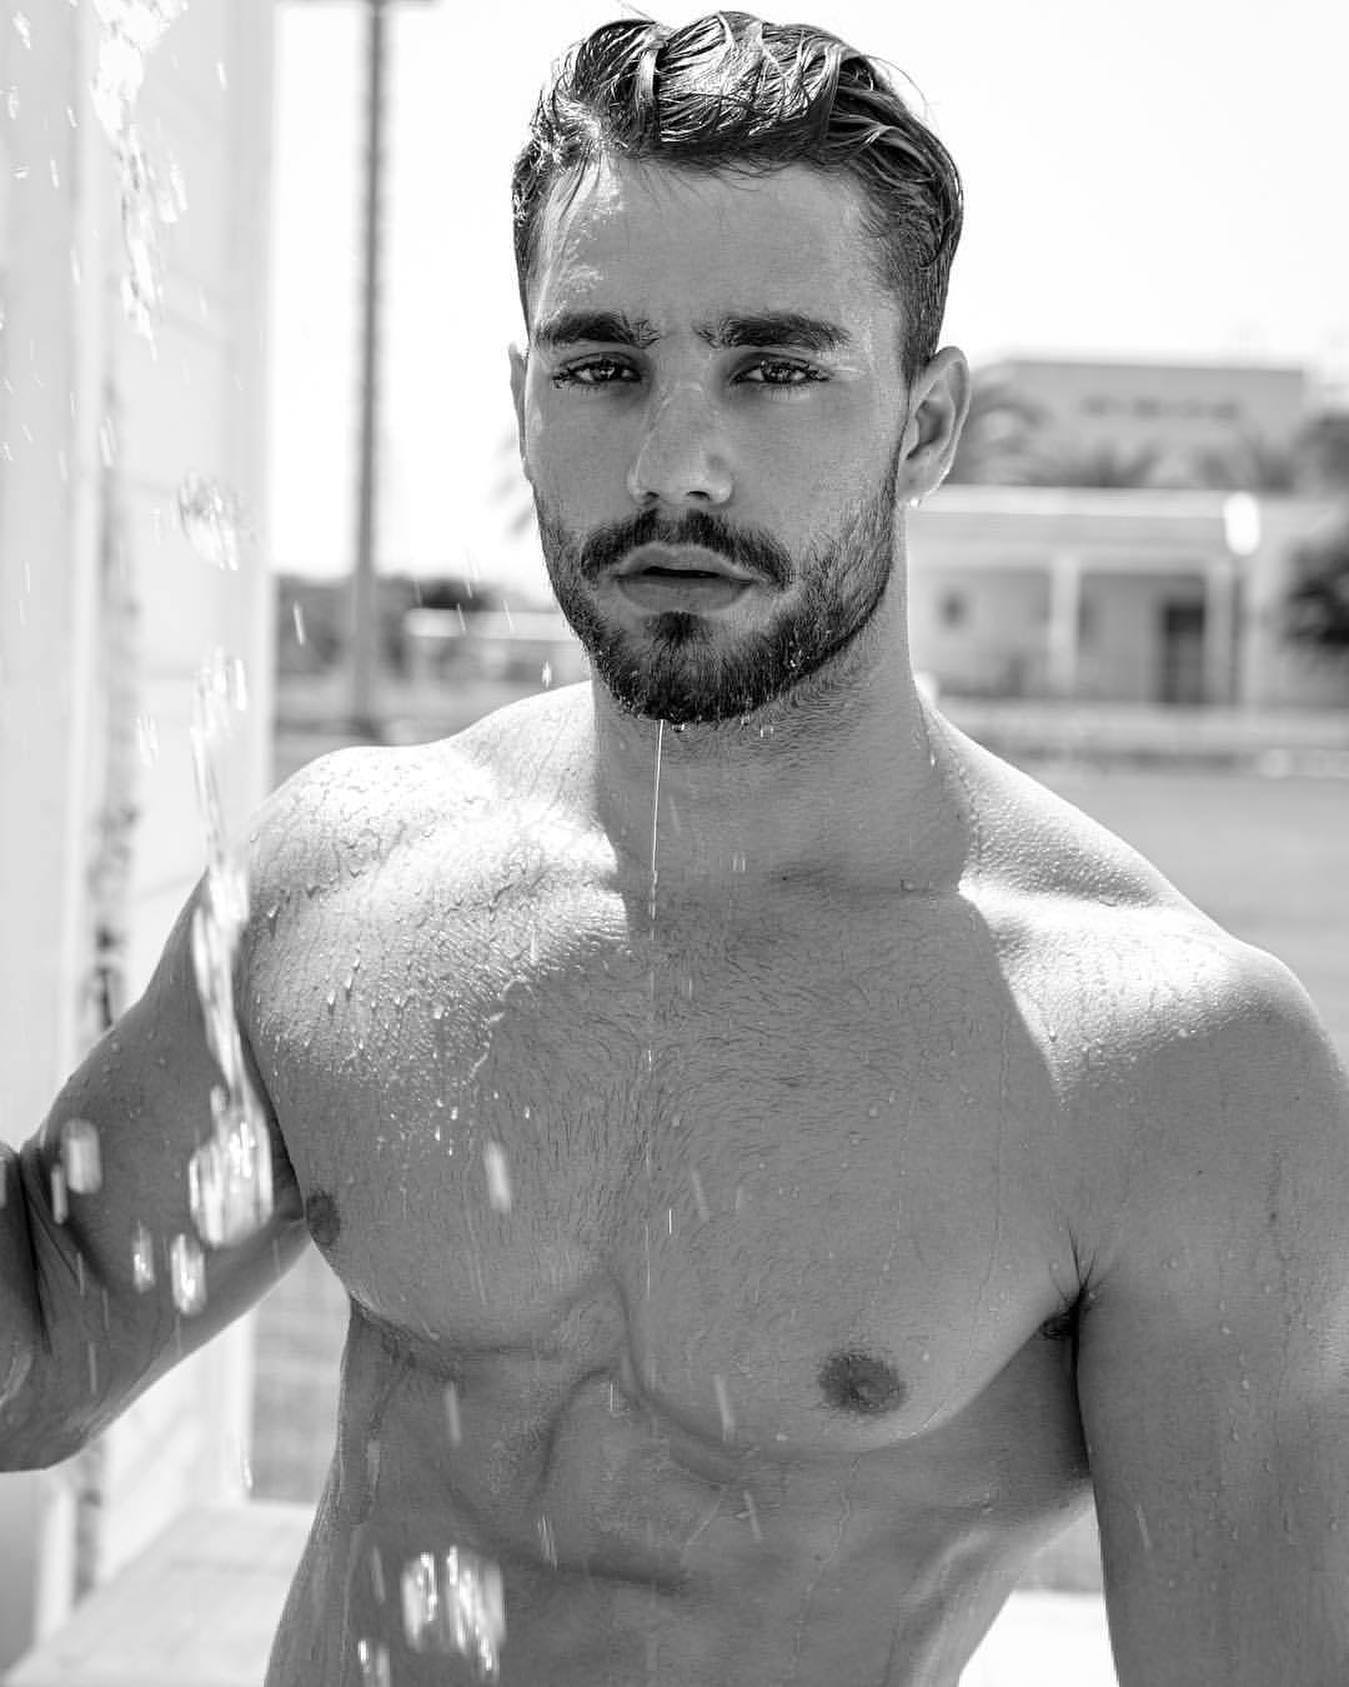 #men #wet #hunks #hotmen #muscle #blackandwhite